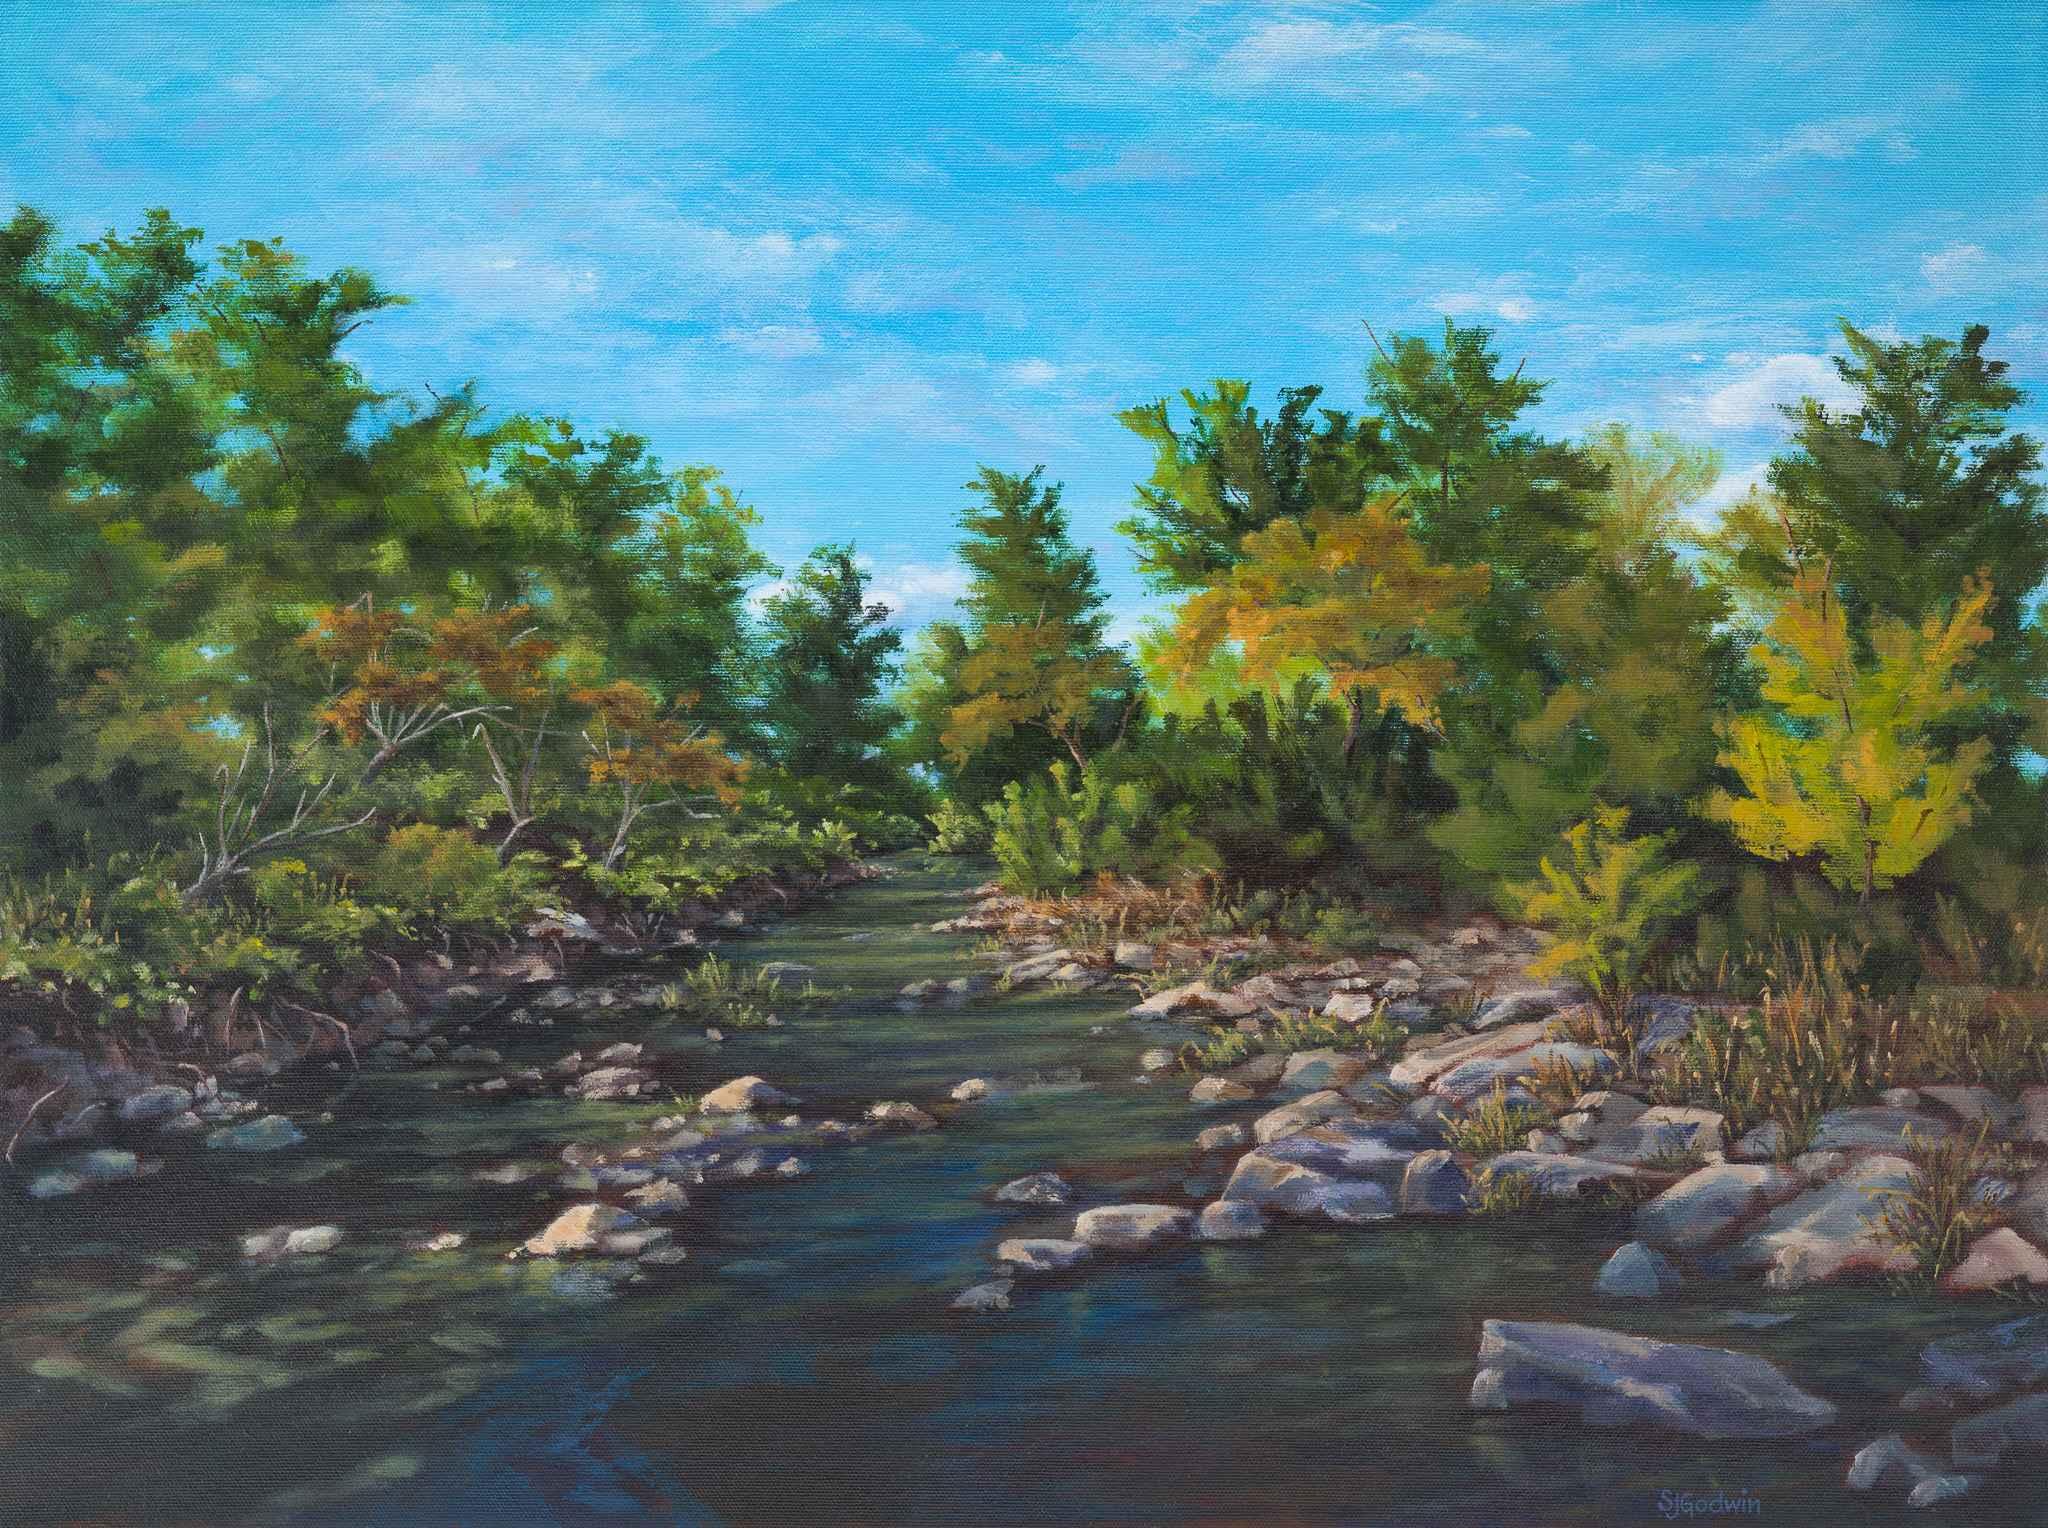 Humboldt Creek Hues by  Sue Godwin - Masterpiece Online